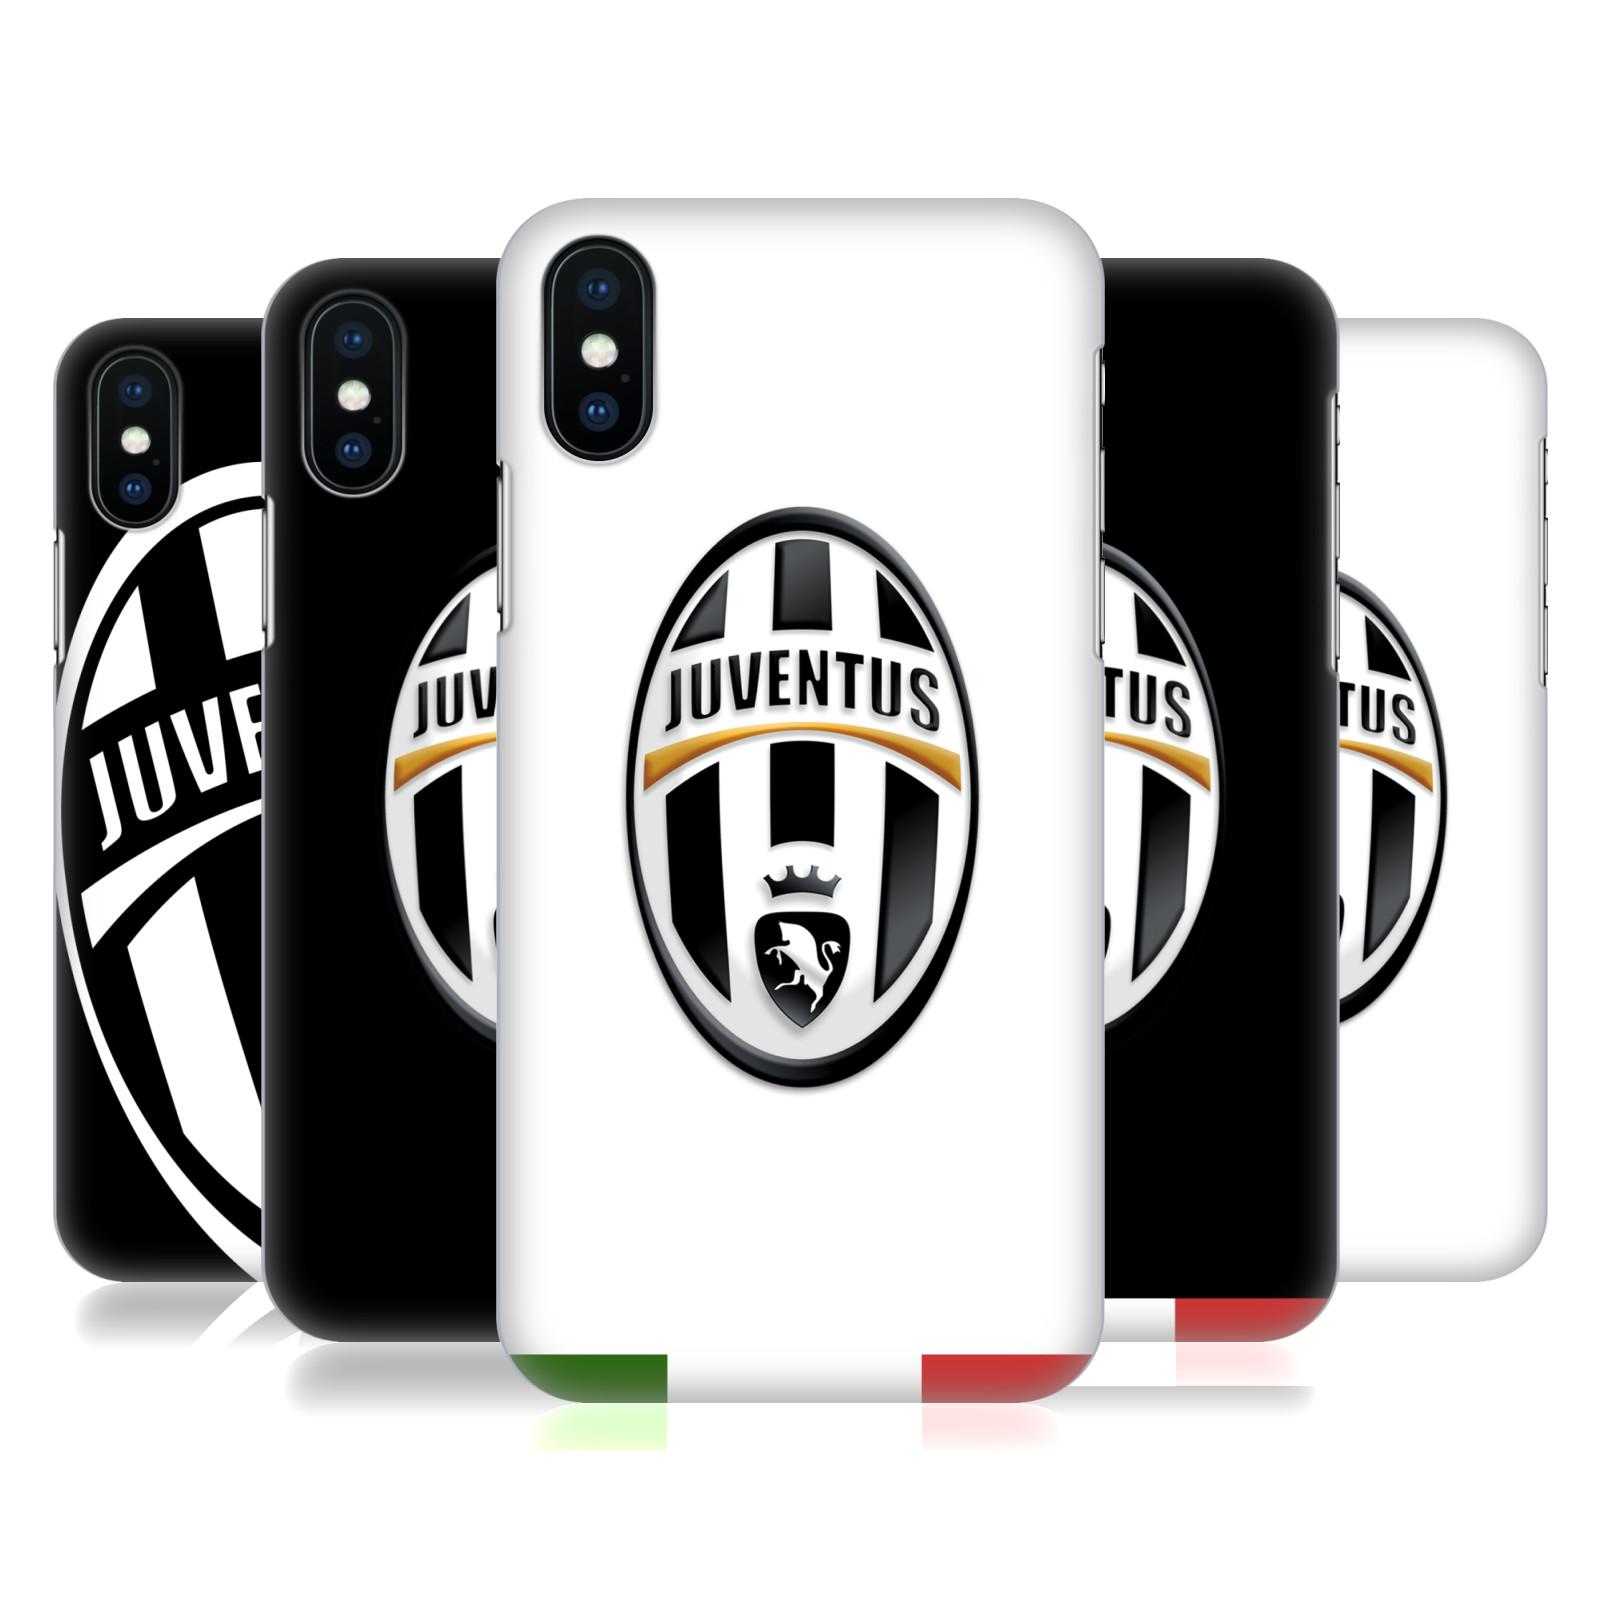 Juventus Football Club Crest